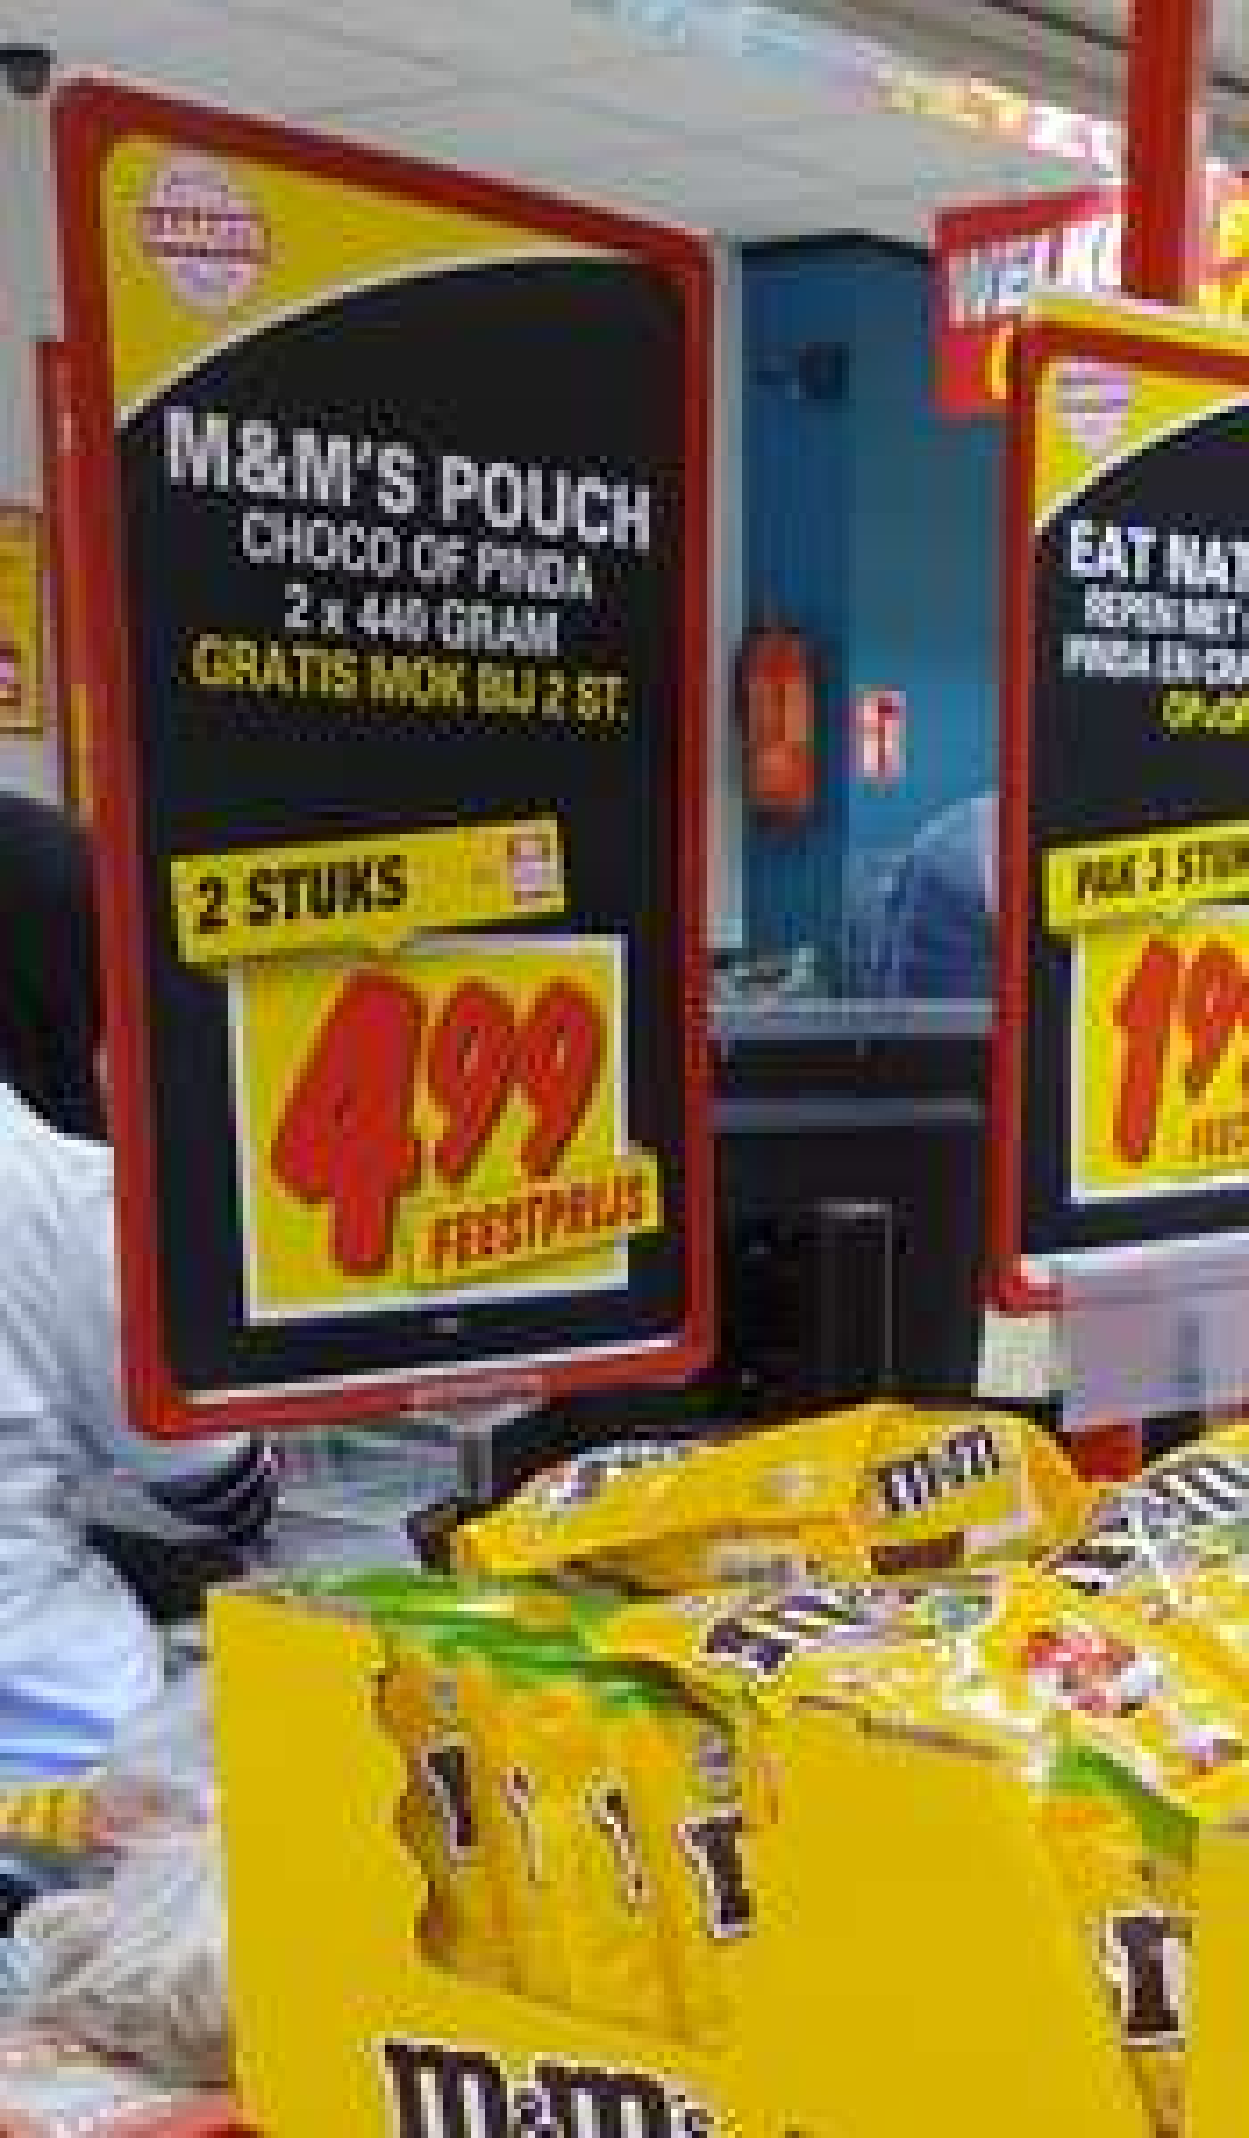 2 Zakken M&M's Maxi zakken plus Mok voor €4,99 (Nettorama)